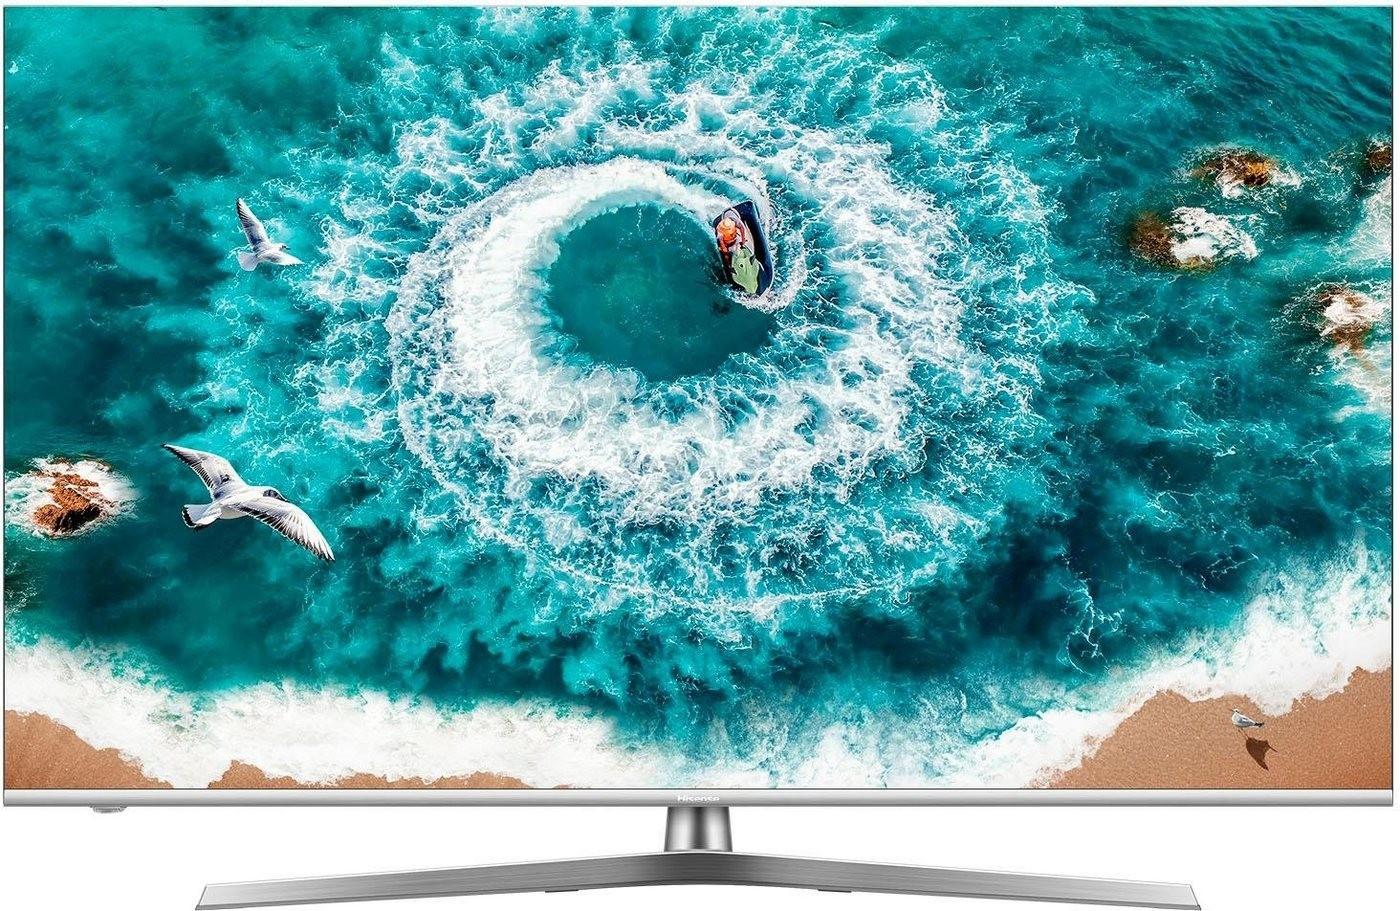 "Home Office bei MediaMarkt: z.B. Hisense H55U8B (55"", VA, UHD, Edge-LED + Local Dimming, 120Hz, 8bit+FRC, 450cd/m², Dolby Vision, VIDAA U)"